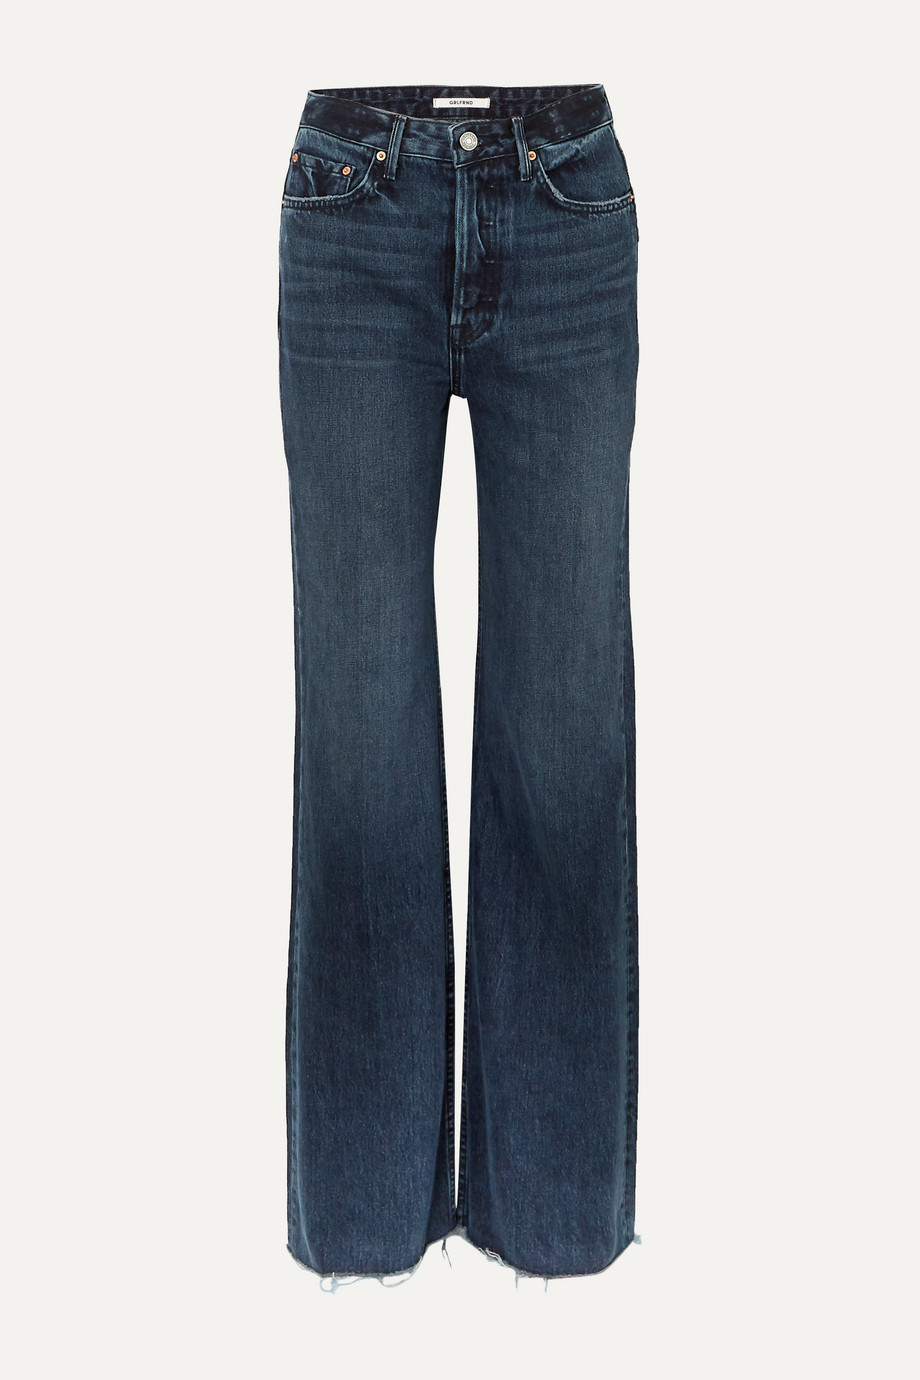 GRLFRND Carla high-rise wide-leg jeans